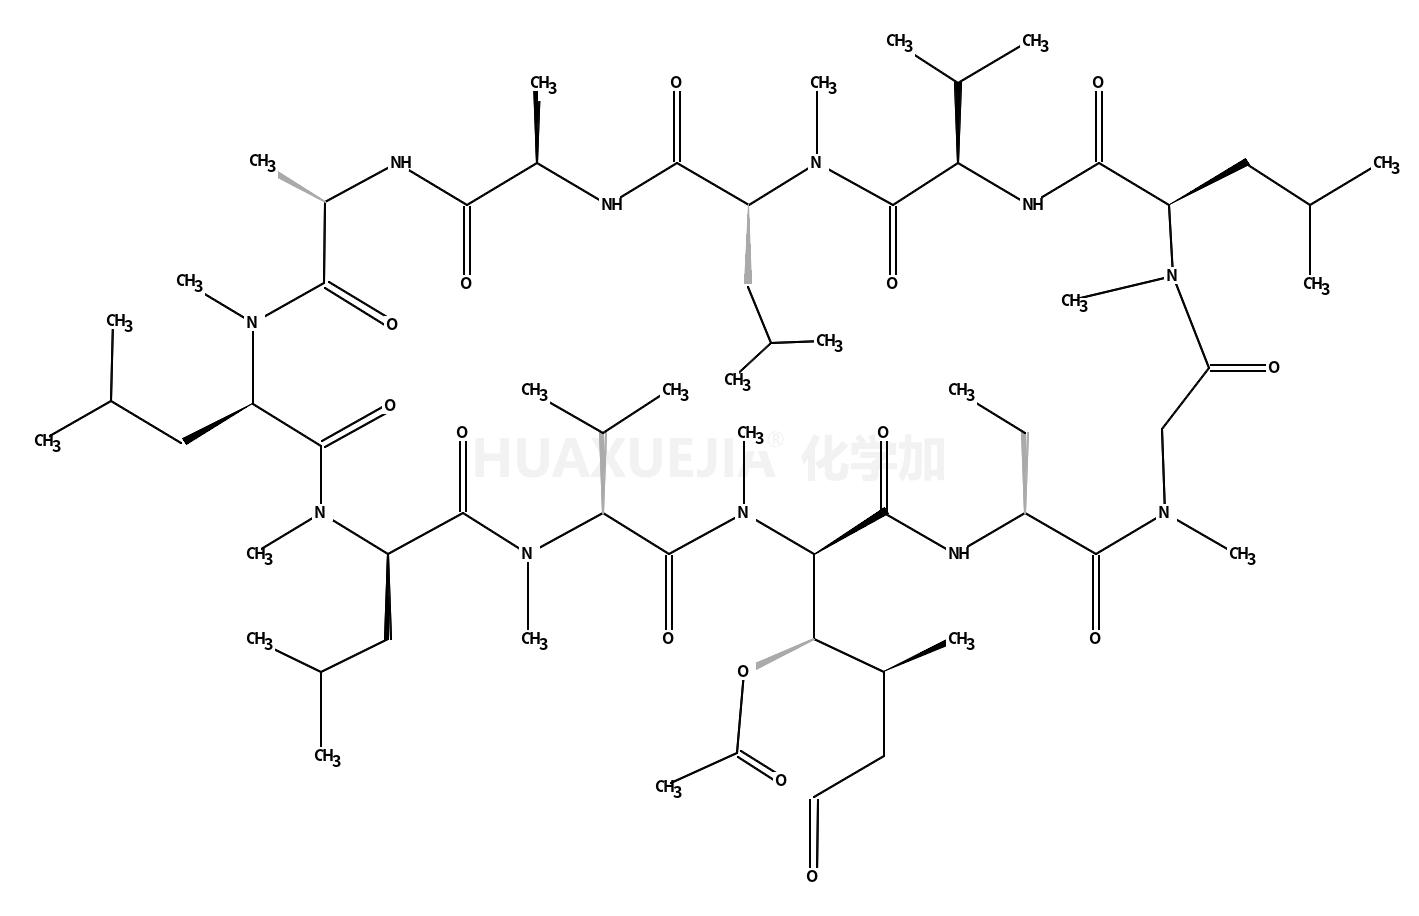 [(3R,14S)-5-(dimethylamino)-3,15-dimethyl-14-[[(2S)-4-methyl-2-(methylamino)pentanoyl]amino]-1,6,13-trioxohexadecan-4-yl] acetate